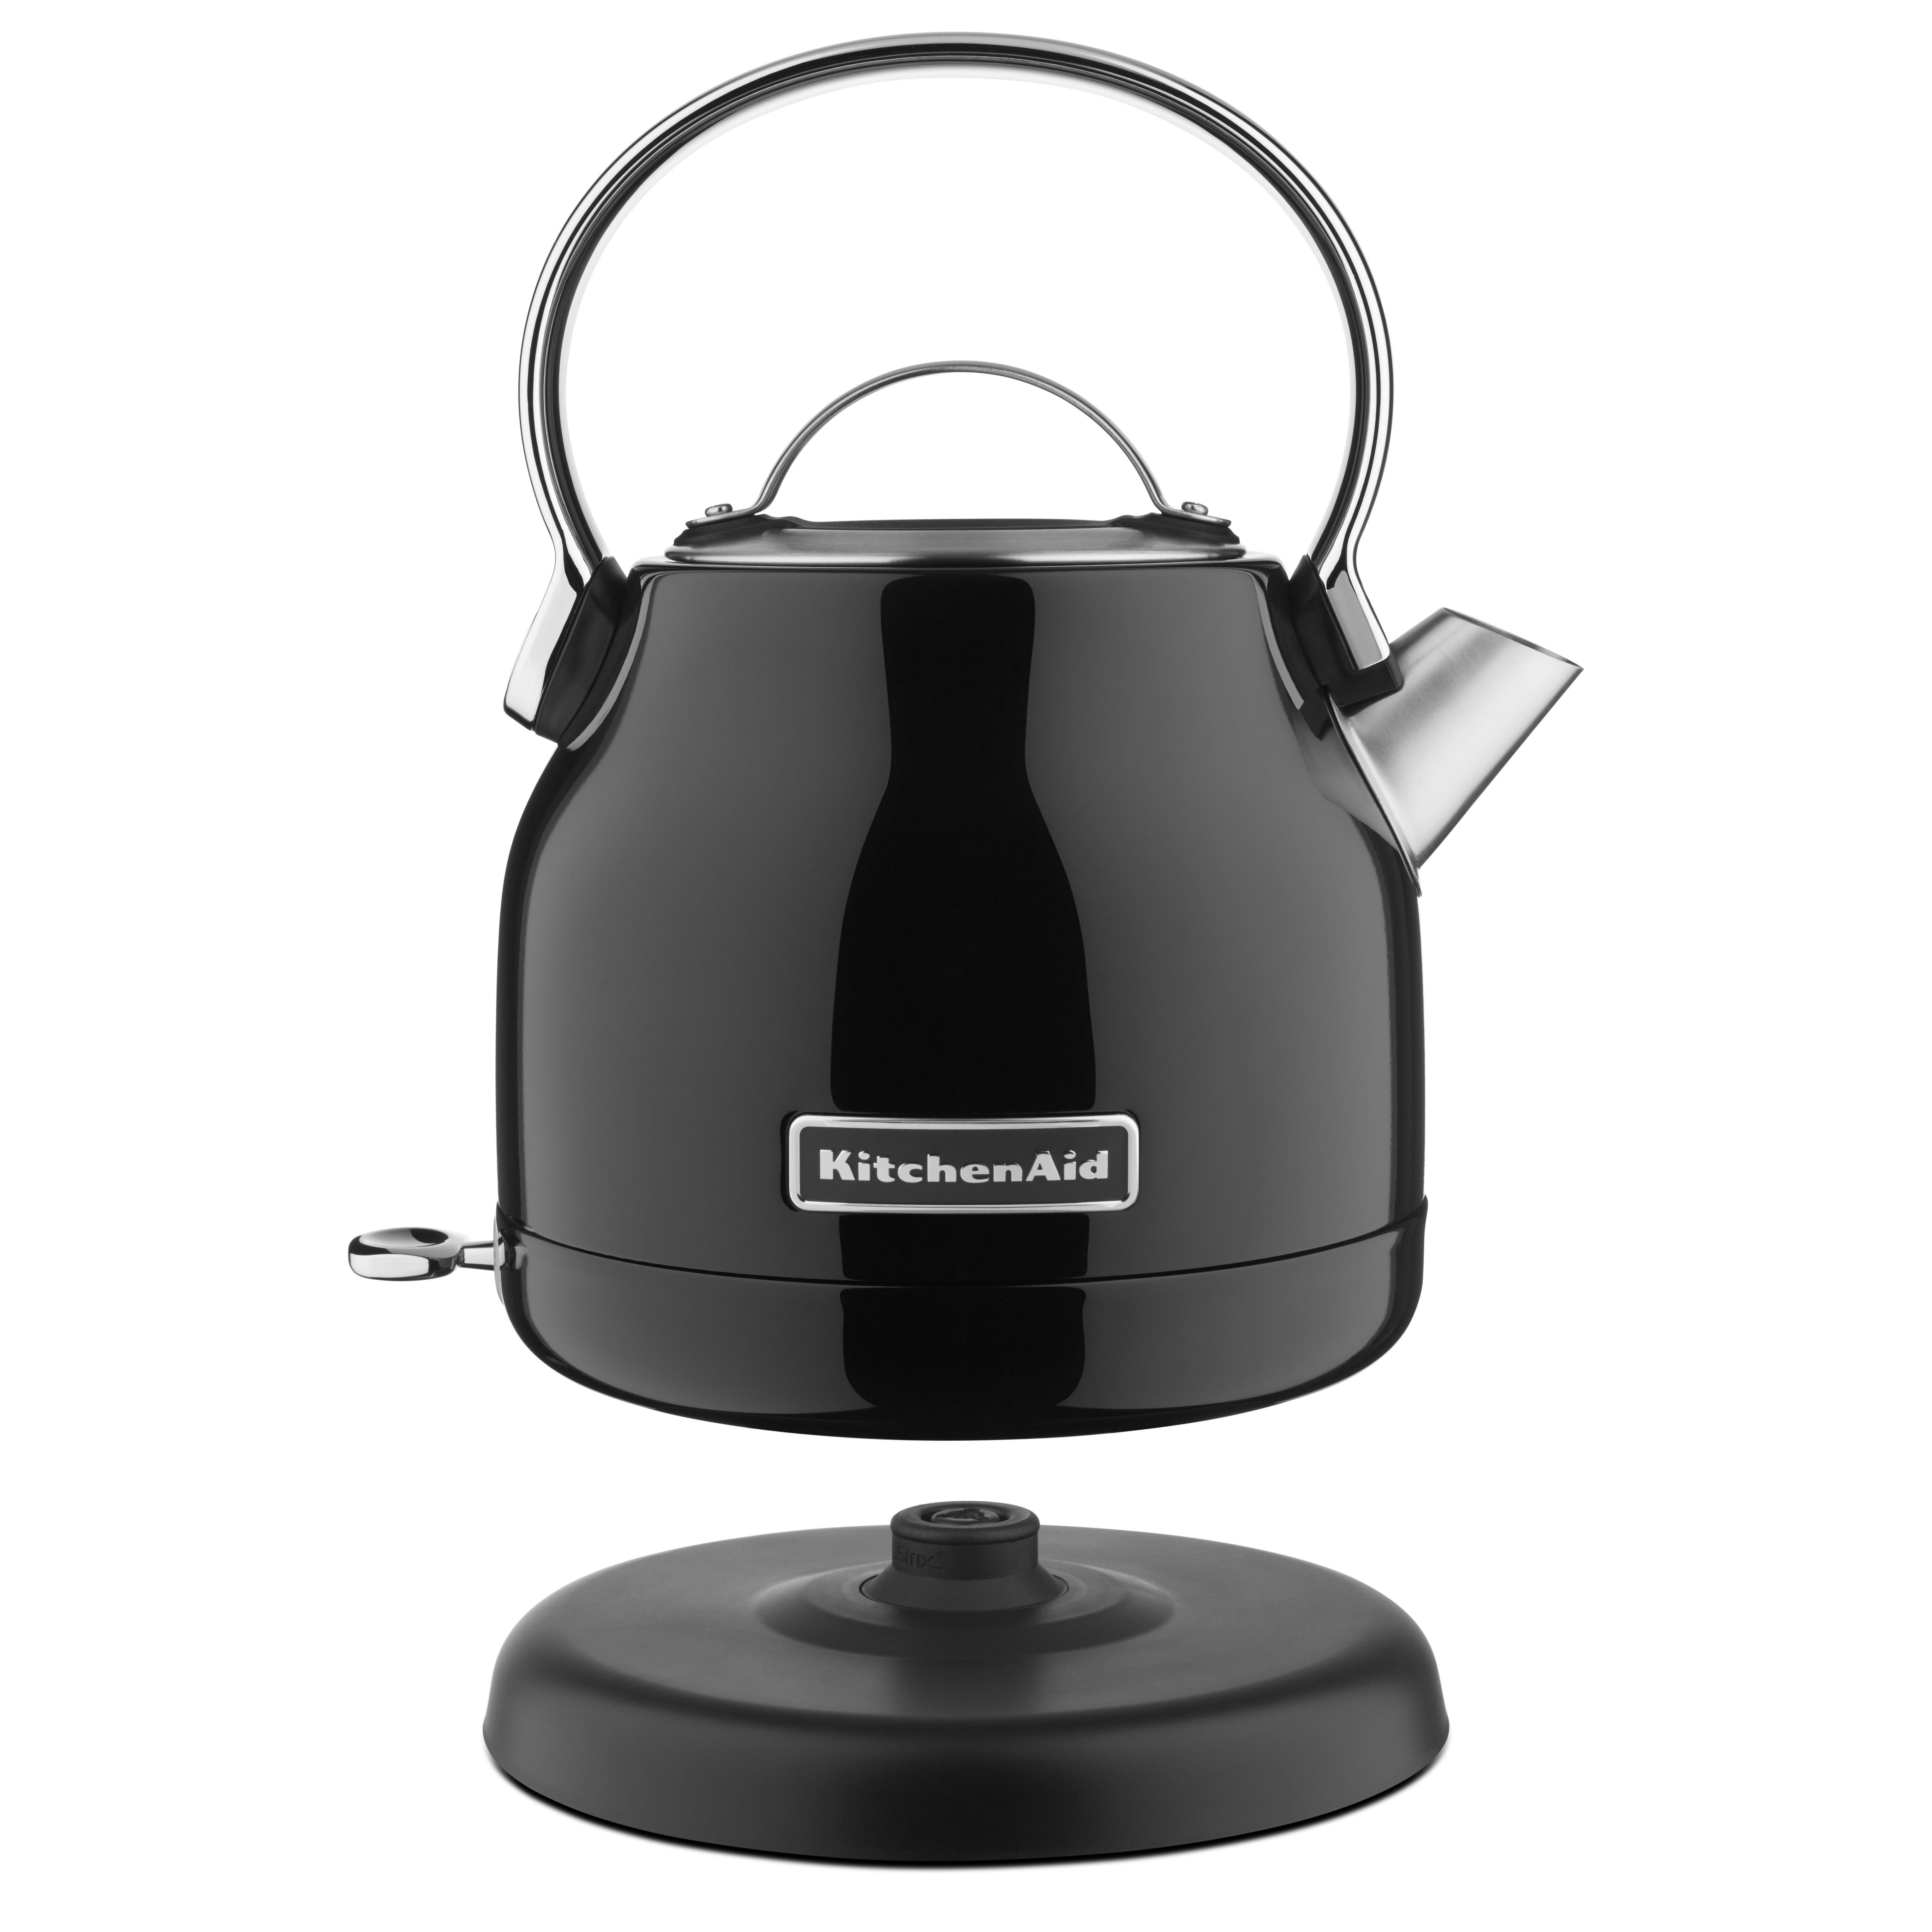 Kitchenaid 1 32 Qt Stainless Steel Electric Tea Kettle